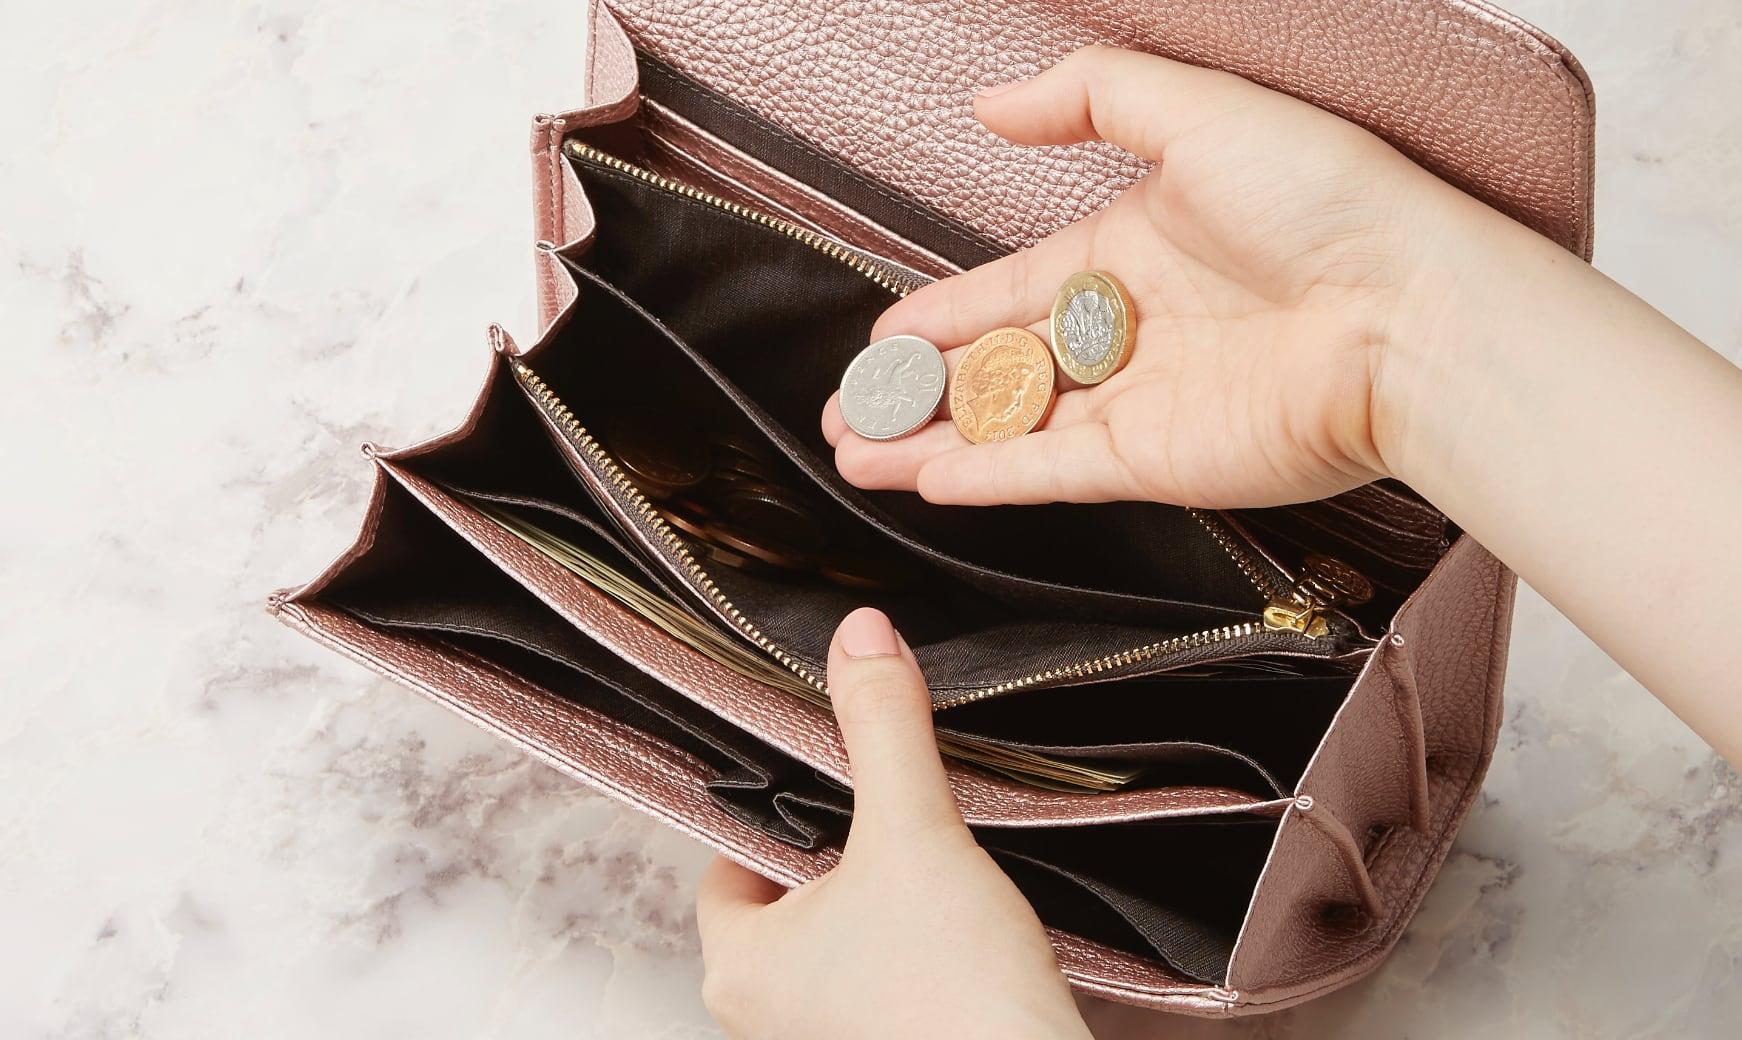 29_Pocket_Wallet_Bag_Currency.jpg